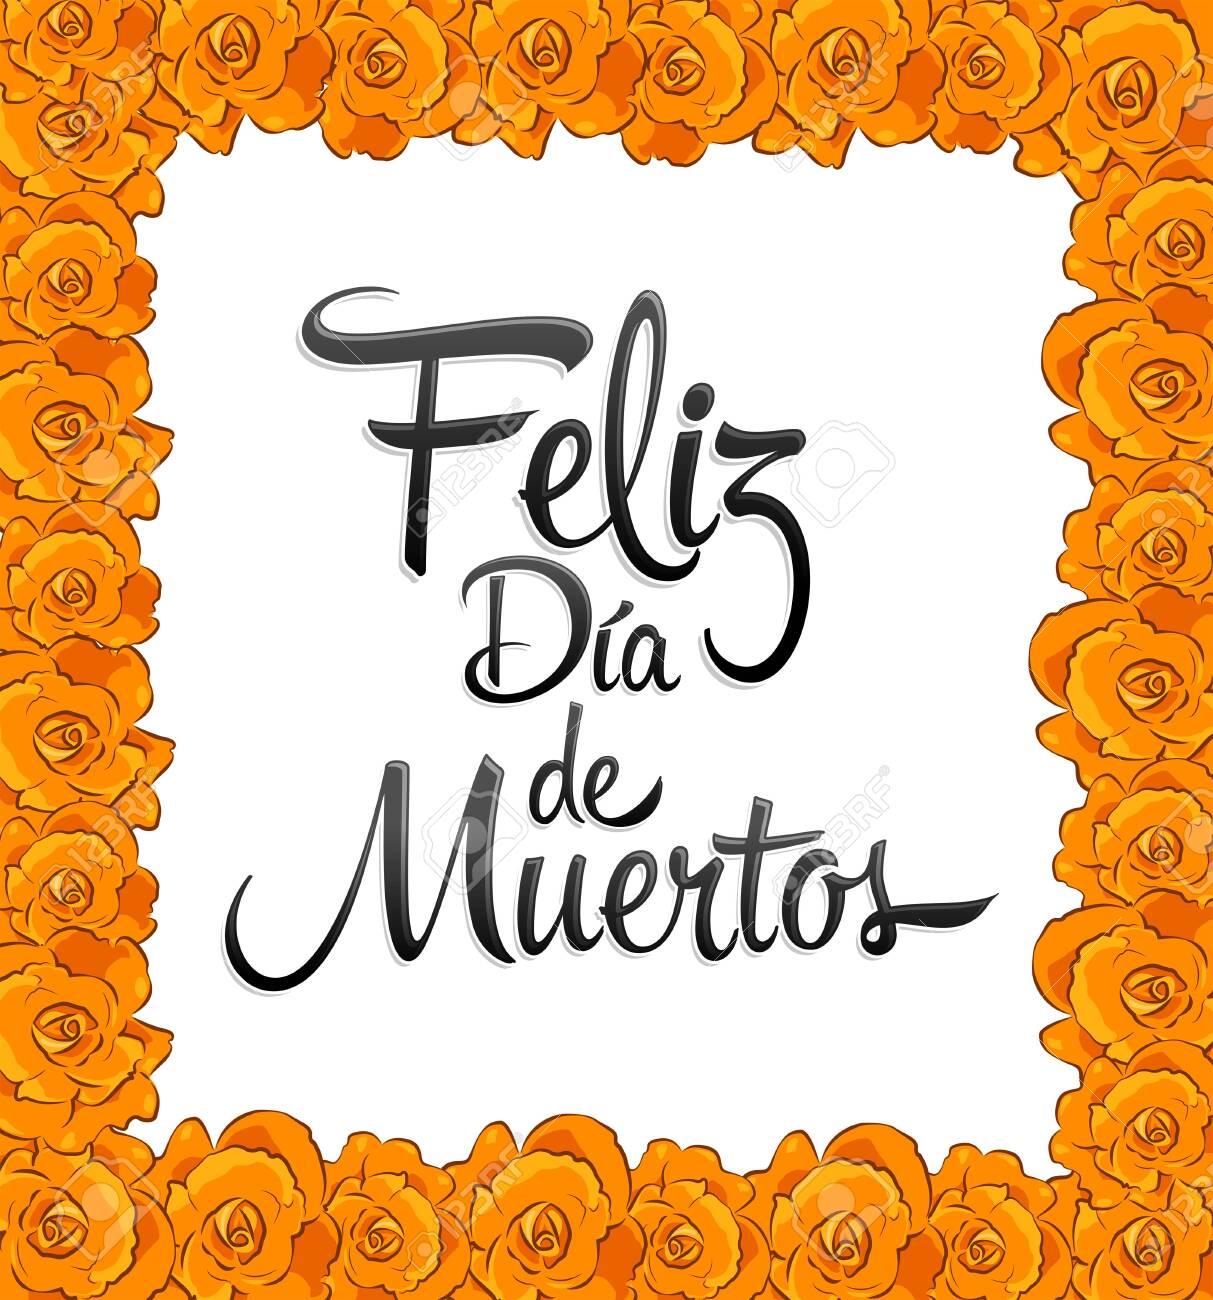 Feliz Dia de Muertos, Happy day of the Dead spanish text frame with trditional Flower. - 157107361